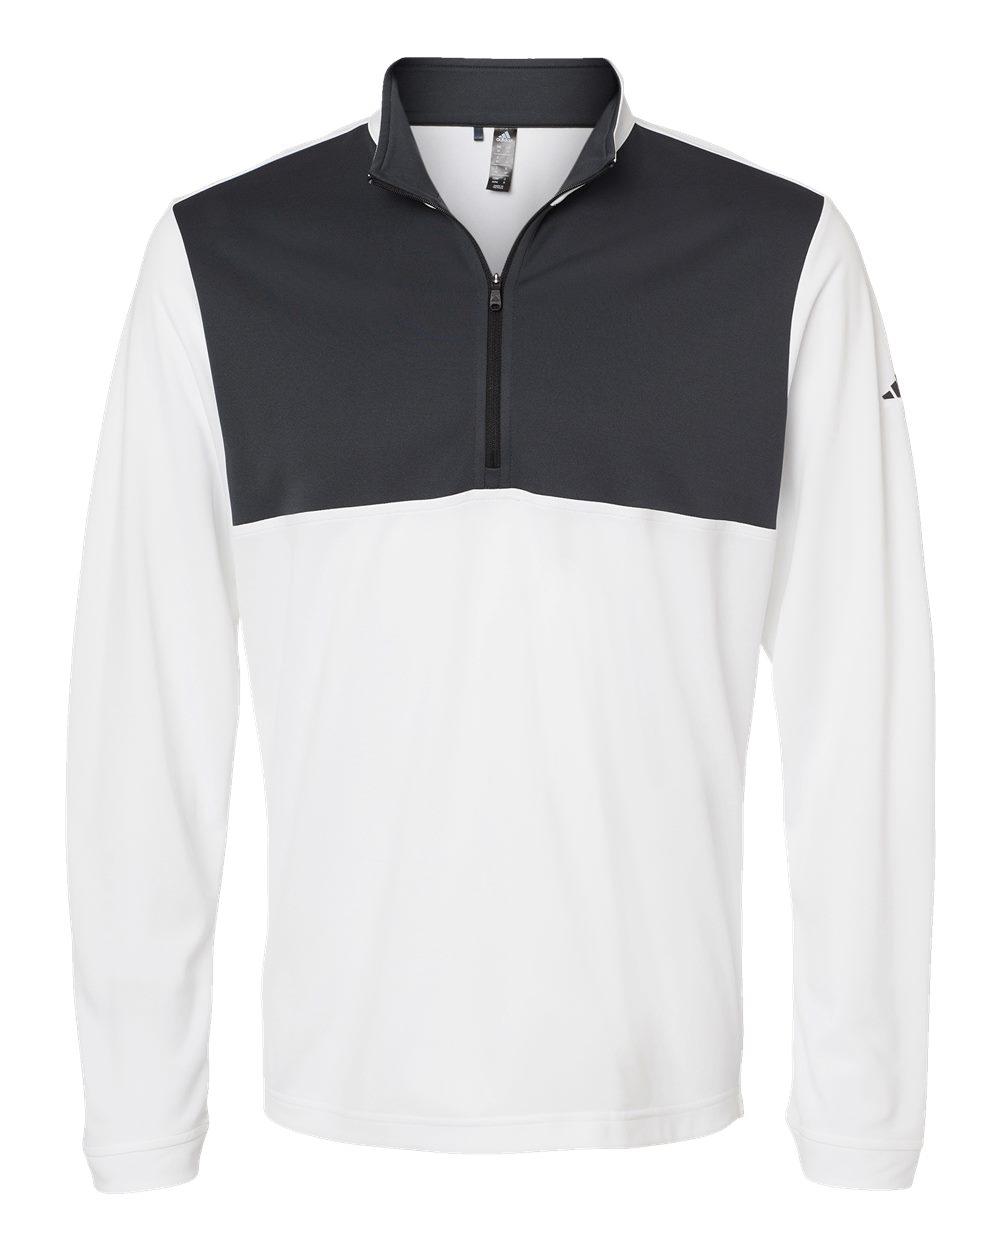 Adidas-Mens-Lightweight-UPF-pullover-Shirt-Warmup-A280-up-to-4XL thumbnail 21